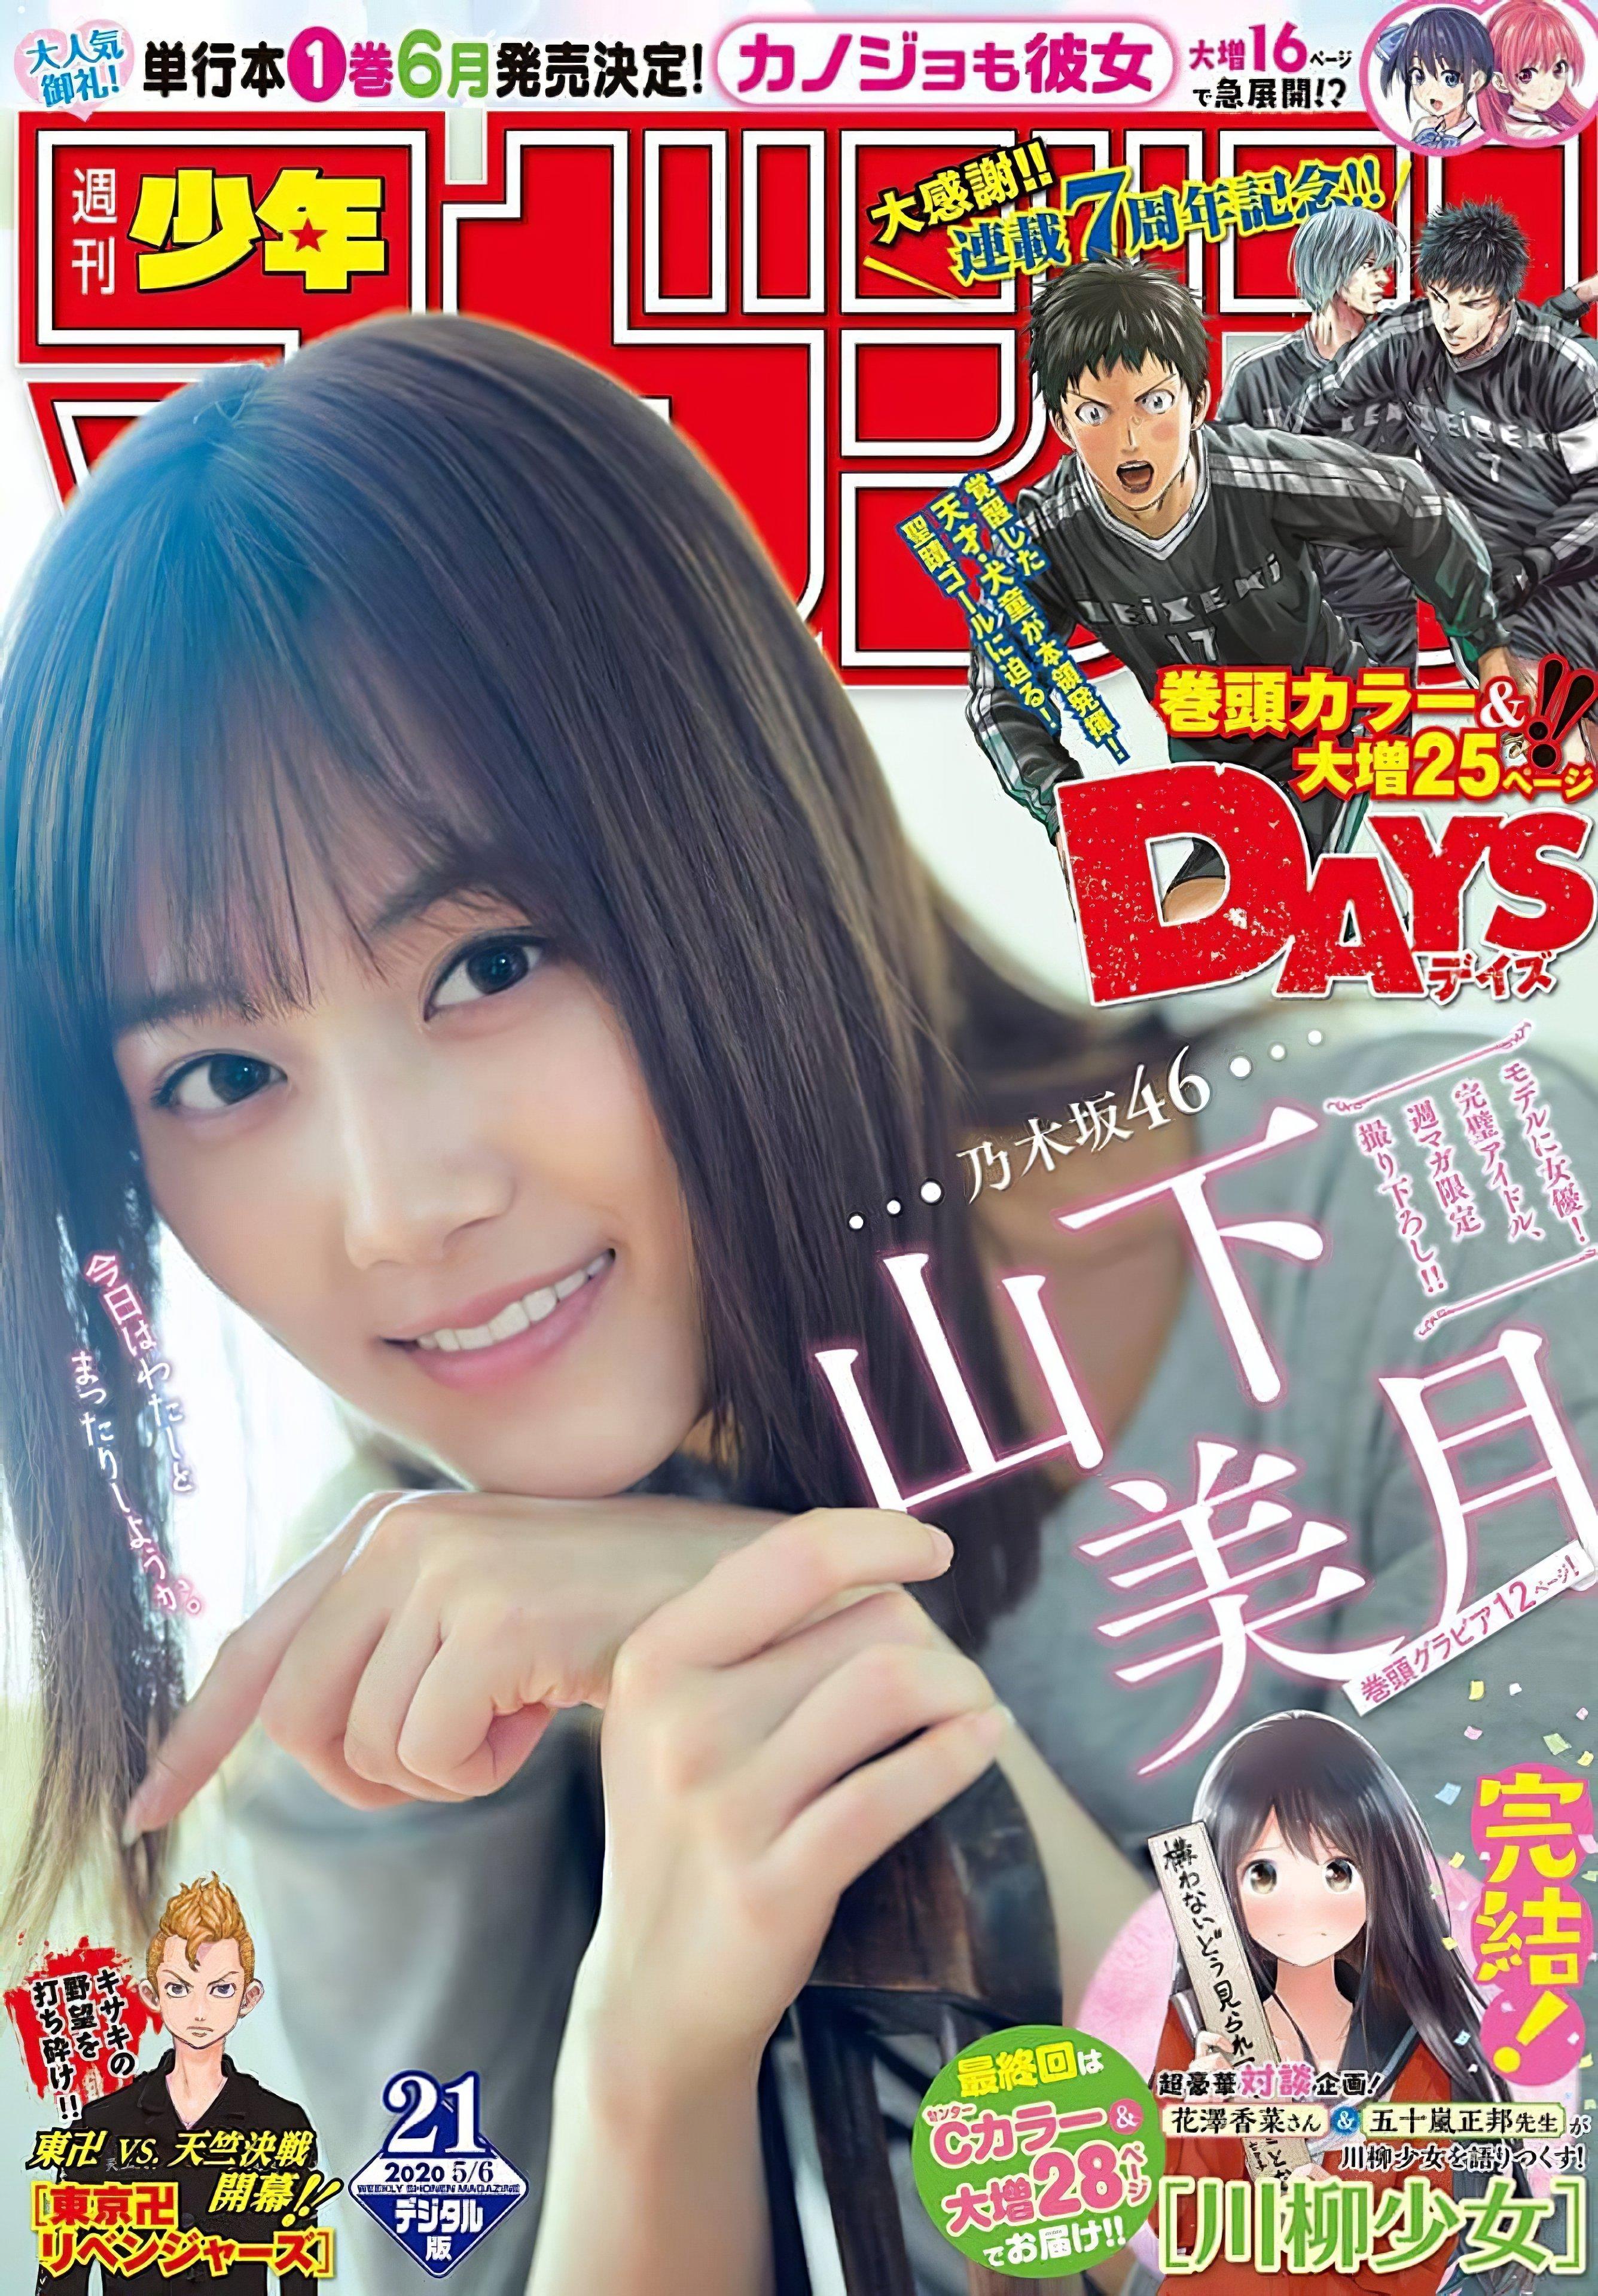 週刊少年マガジン 2020年05月06日号  21号 乃木坂46 山下美月